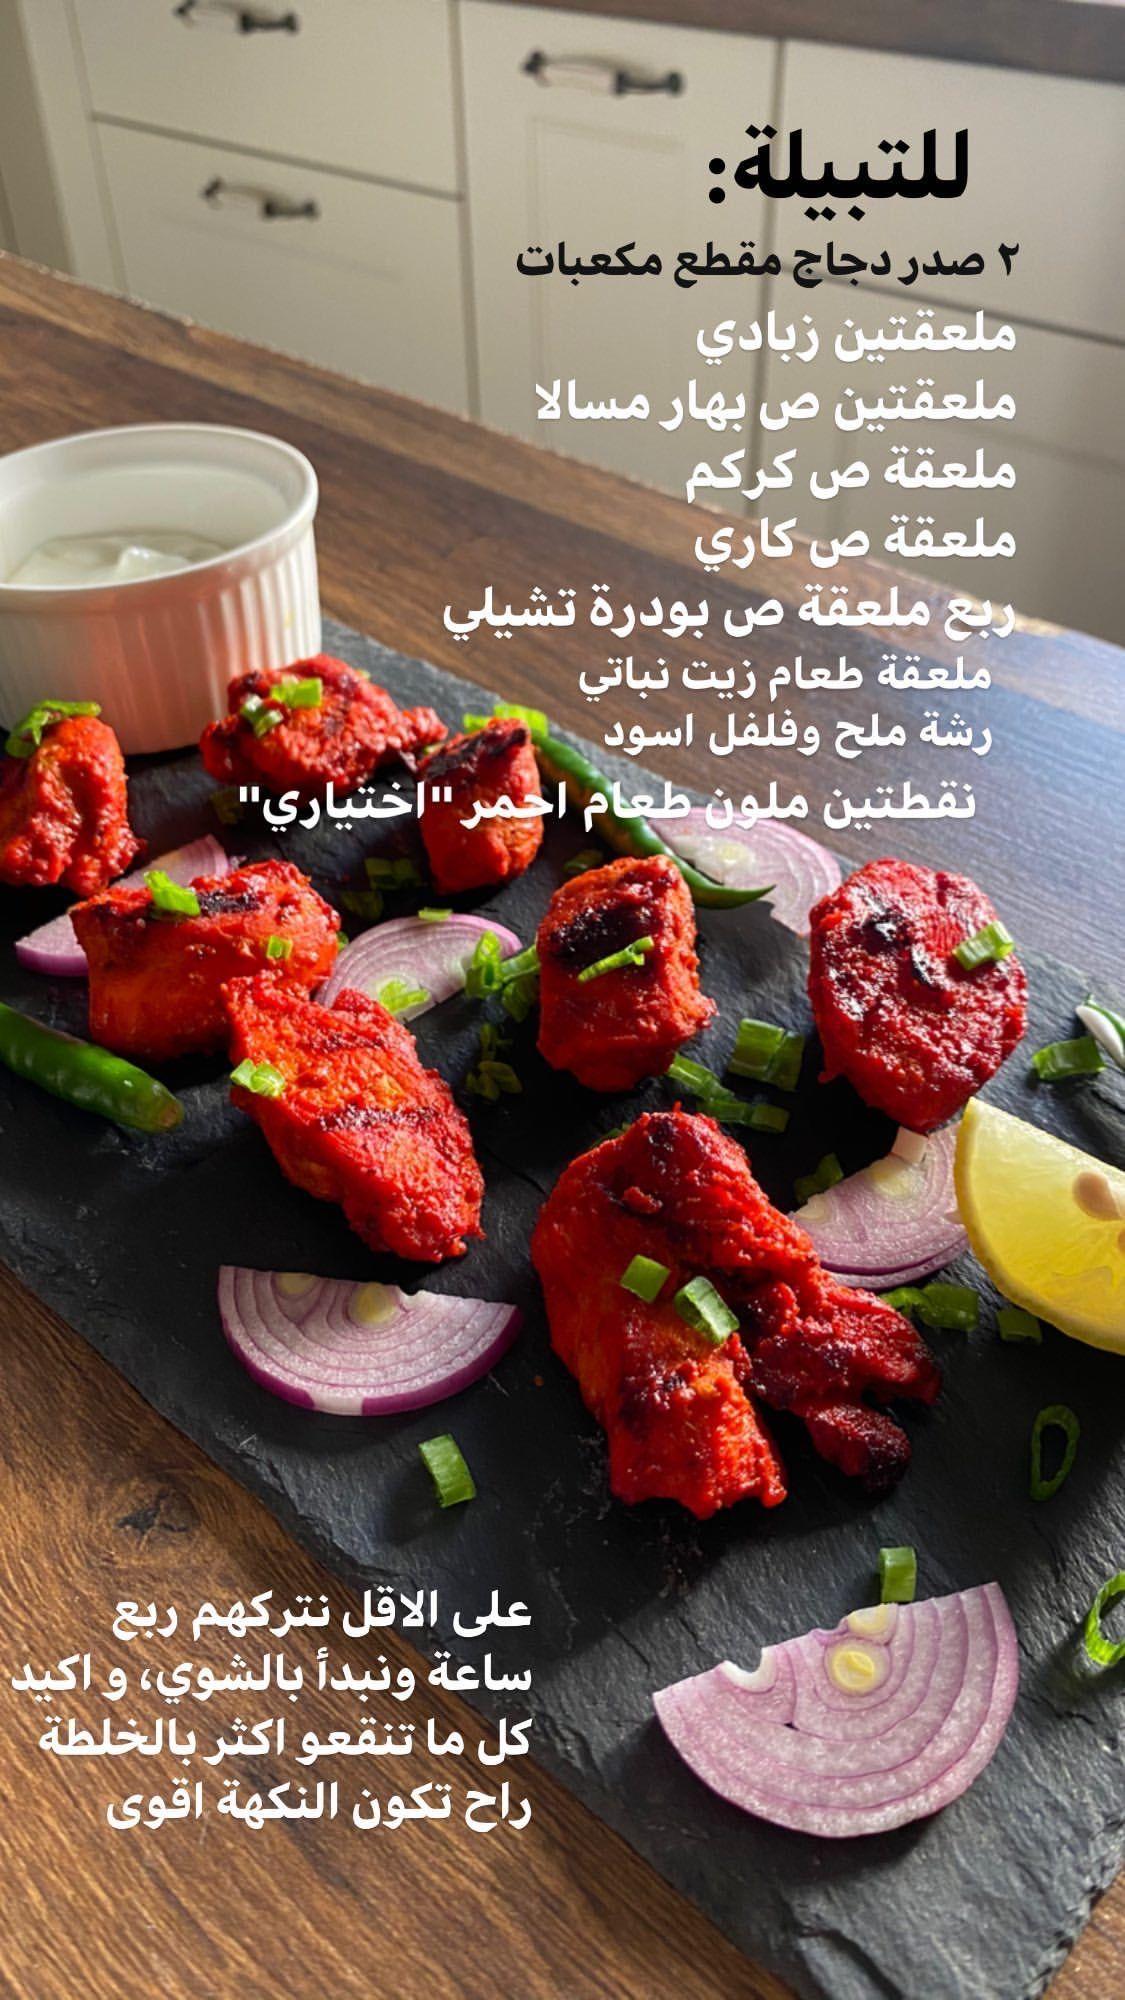 Pin By Istifada استفادة On خواردن و شيرينى و تورشيات Healty Food Food Food And Drink